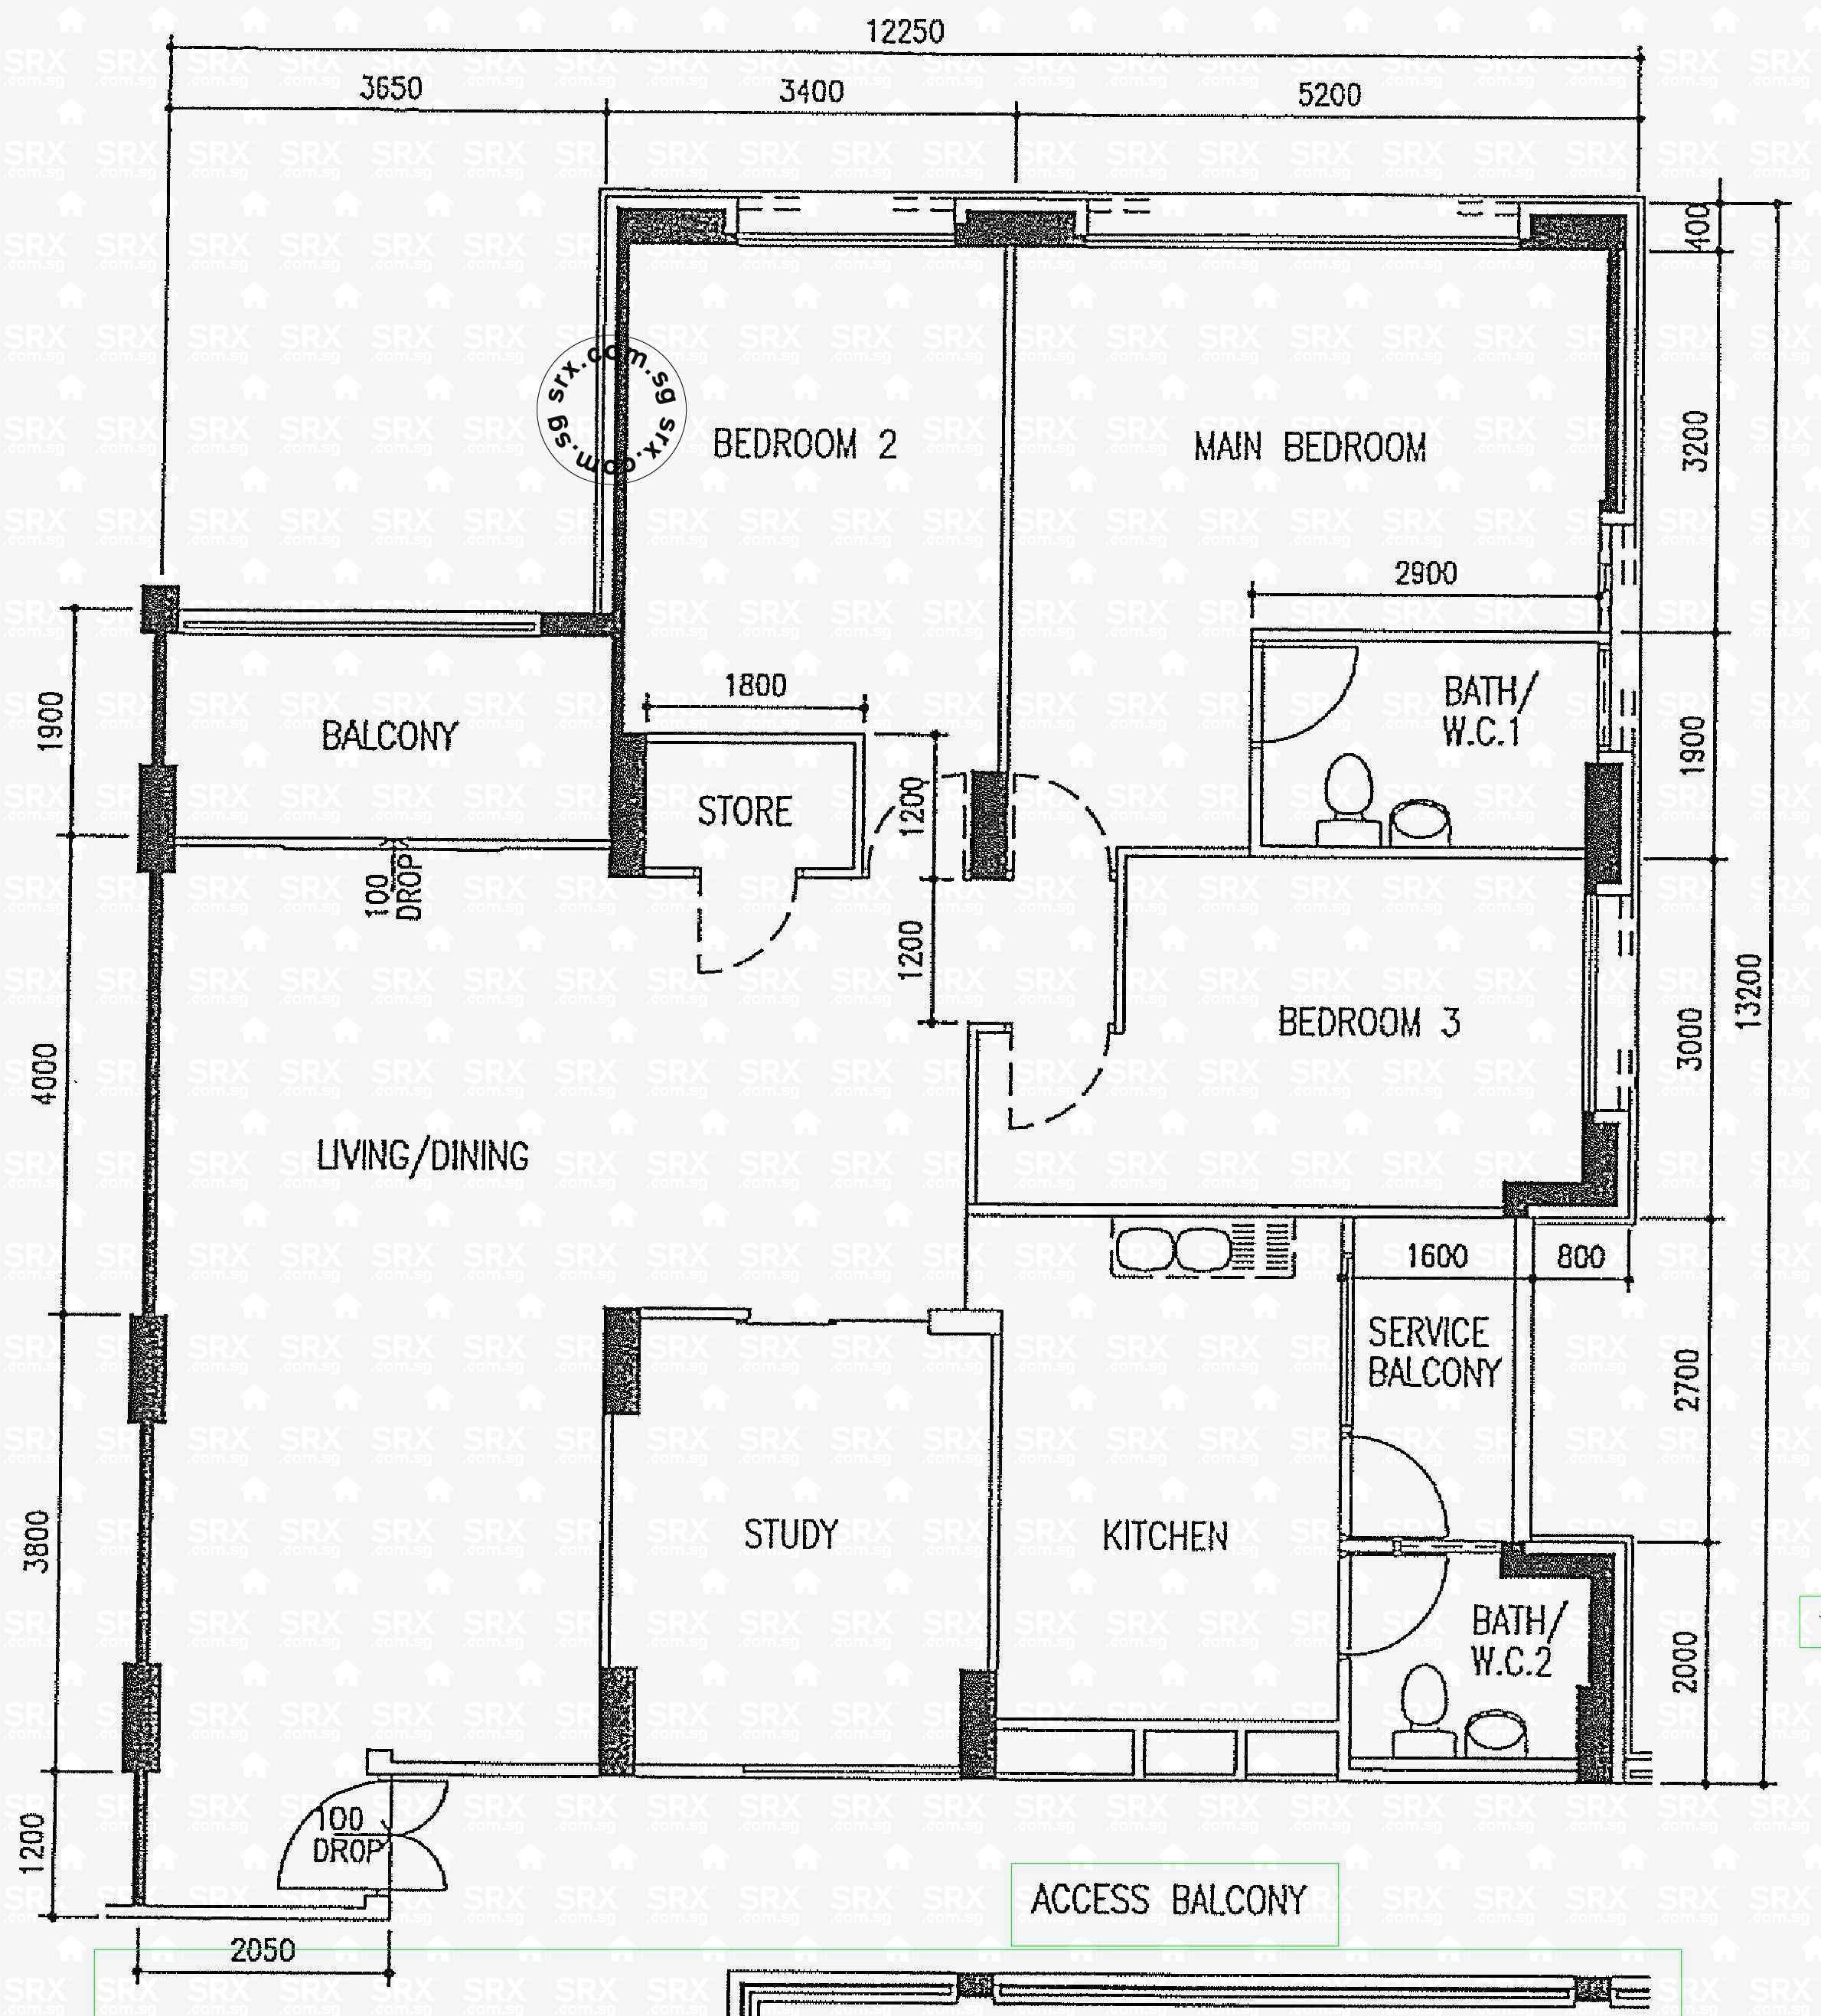 Floor Plans For Pasir Ris Street 21 HDB Details